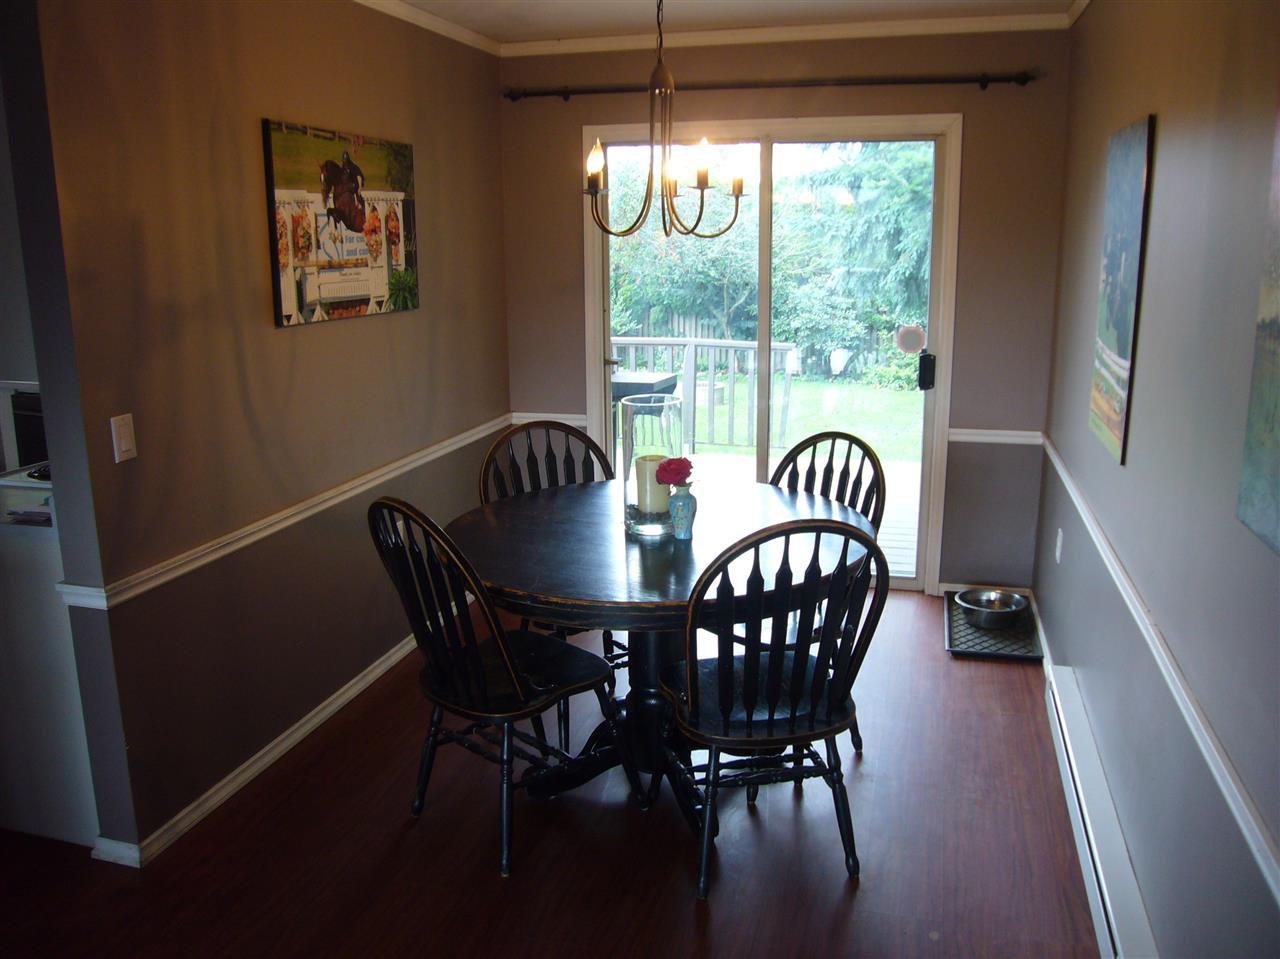 Photo 5: Photos: 6580 EVANS Road in Sardis: Sardis West Vedder Rd House for sale : MLS®# R2085581